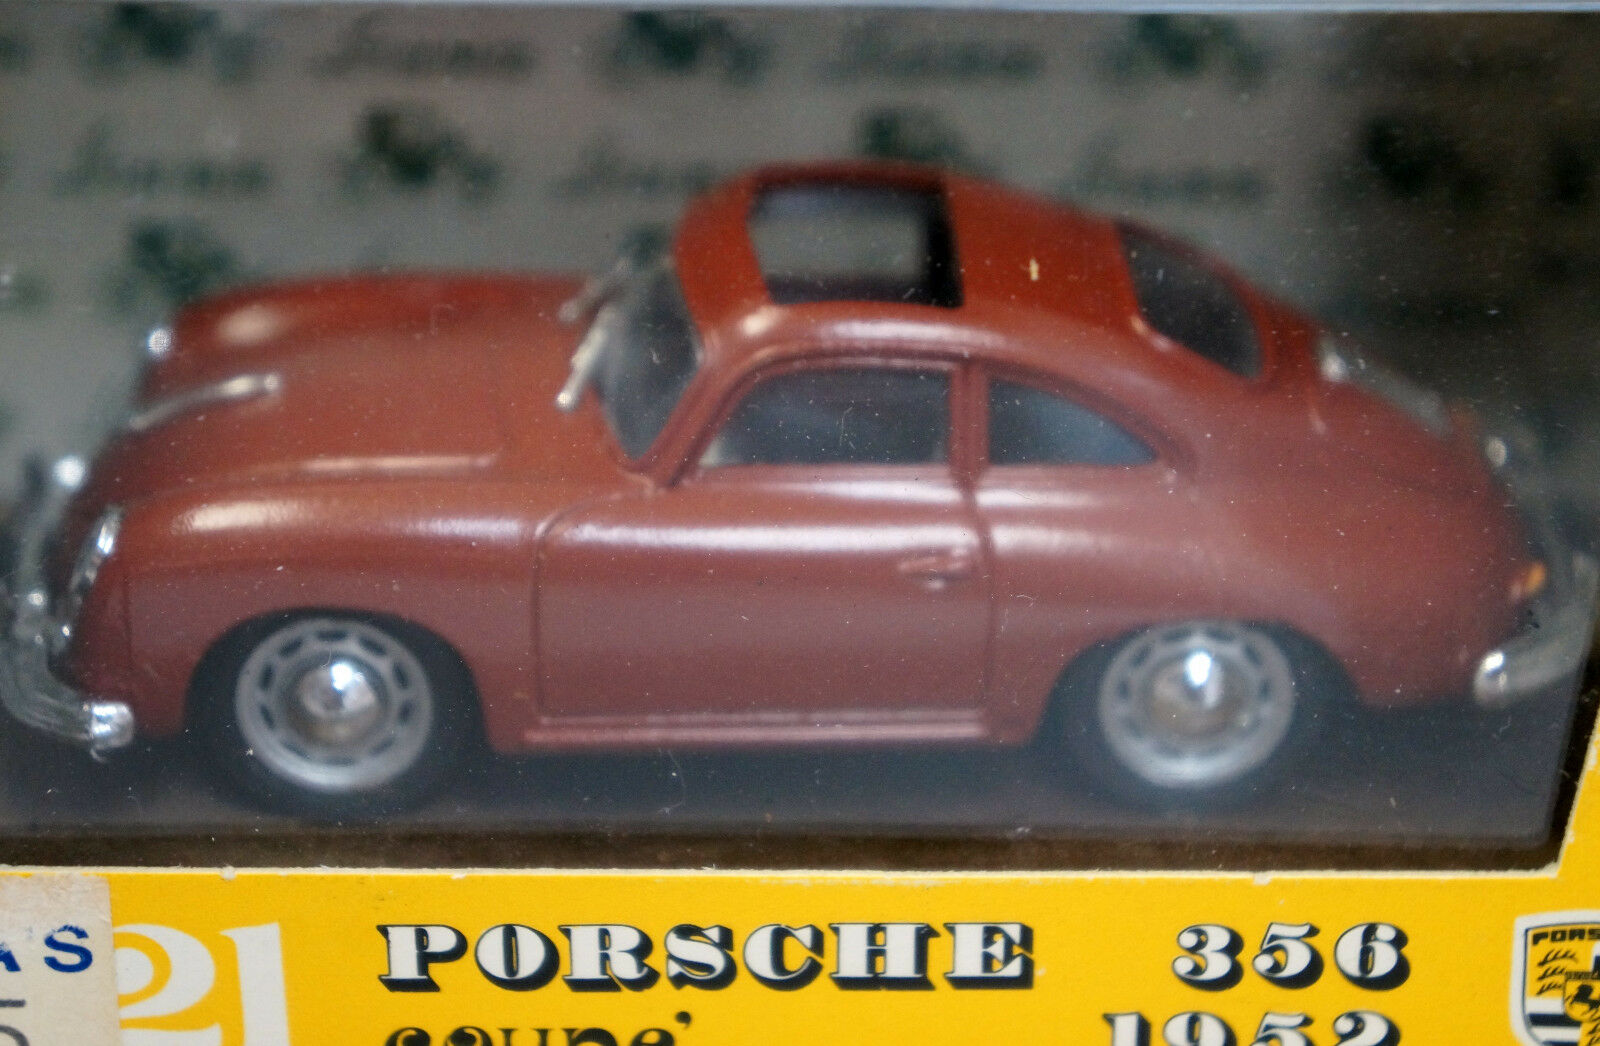 PORSCHE 1952 356 BURGUNDY COUPE SUN ROOF, BRUMM 121 1 43 DIE CAST MODEL CAR NEW